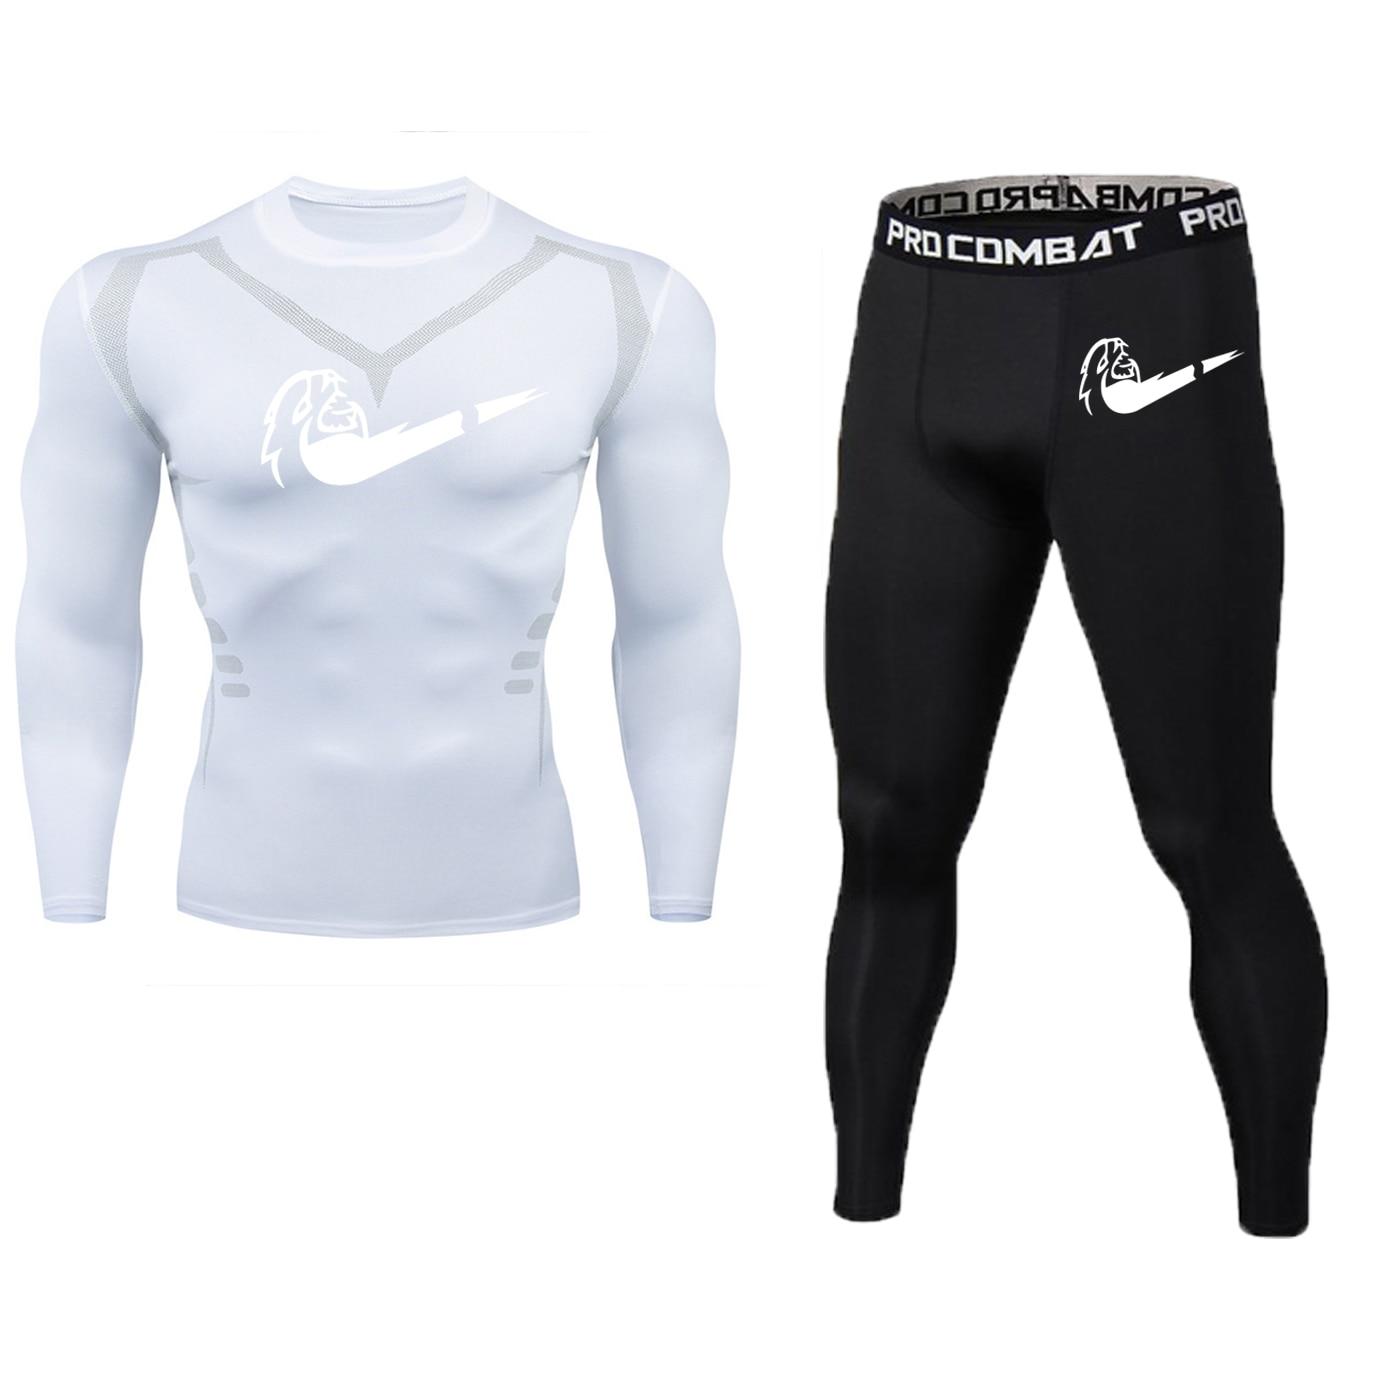 Running Sports 3d Compression Shirt Men's Gym Fitness Long-sleeved T-shirt Running Training Tight Tshirt Top Men's Quick-drying